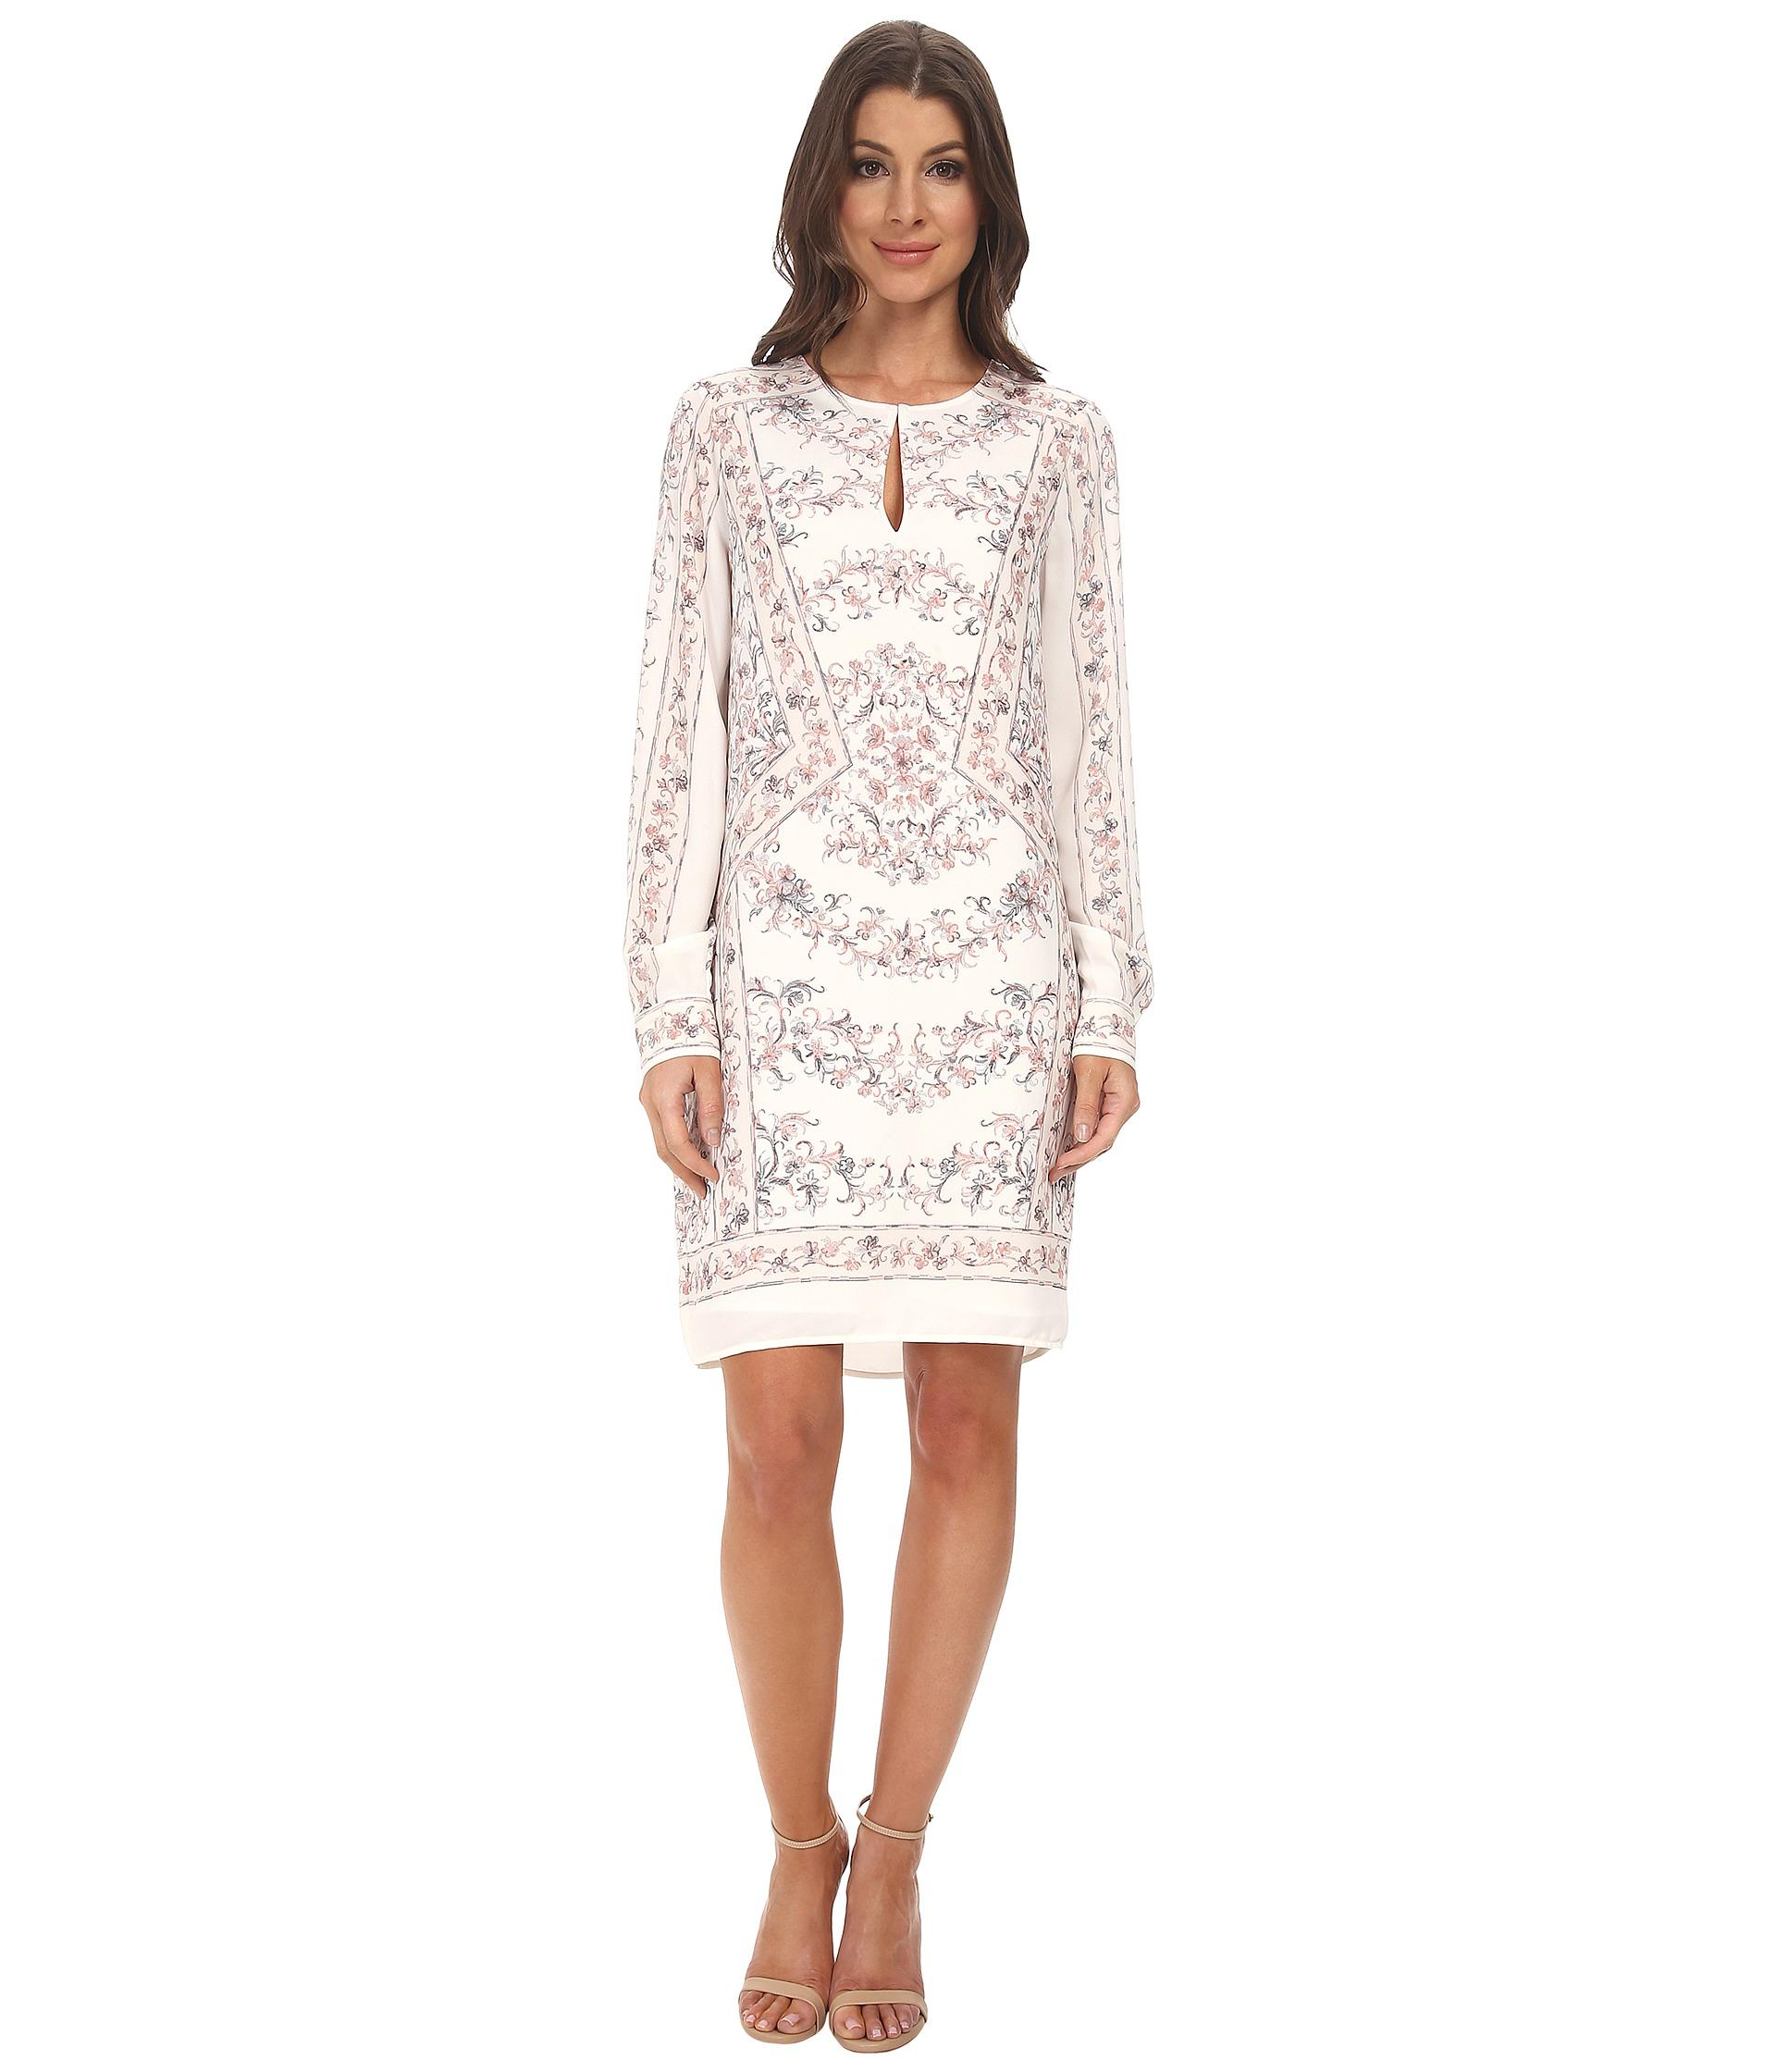 4c8cfaa895a1 Lyst - BCBGMAXAZRIA Freya Long Sleeve Scarf Print Tunic Dress